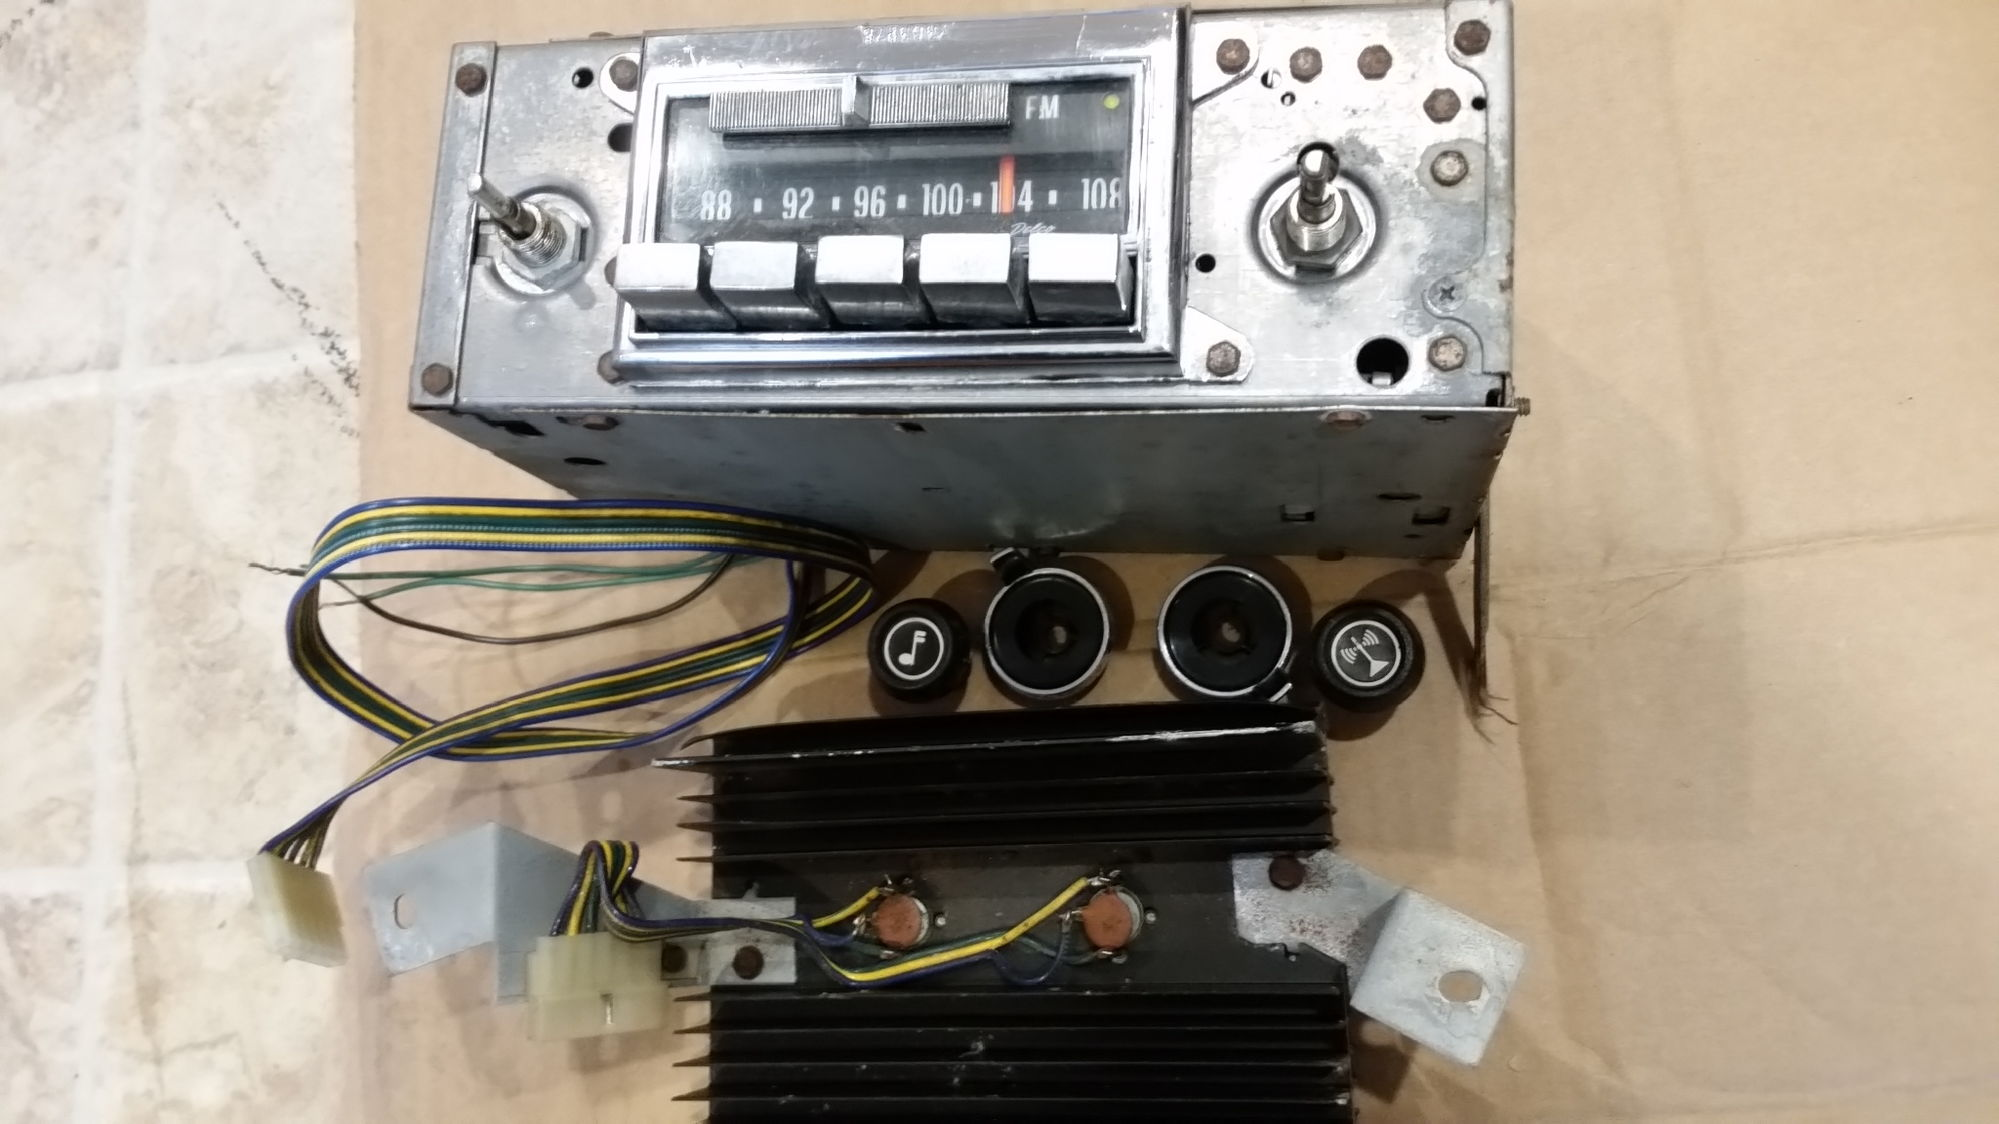 F/S 1974 Stock AM / FM radio, knobs, amp, wiring harness ...